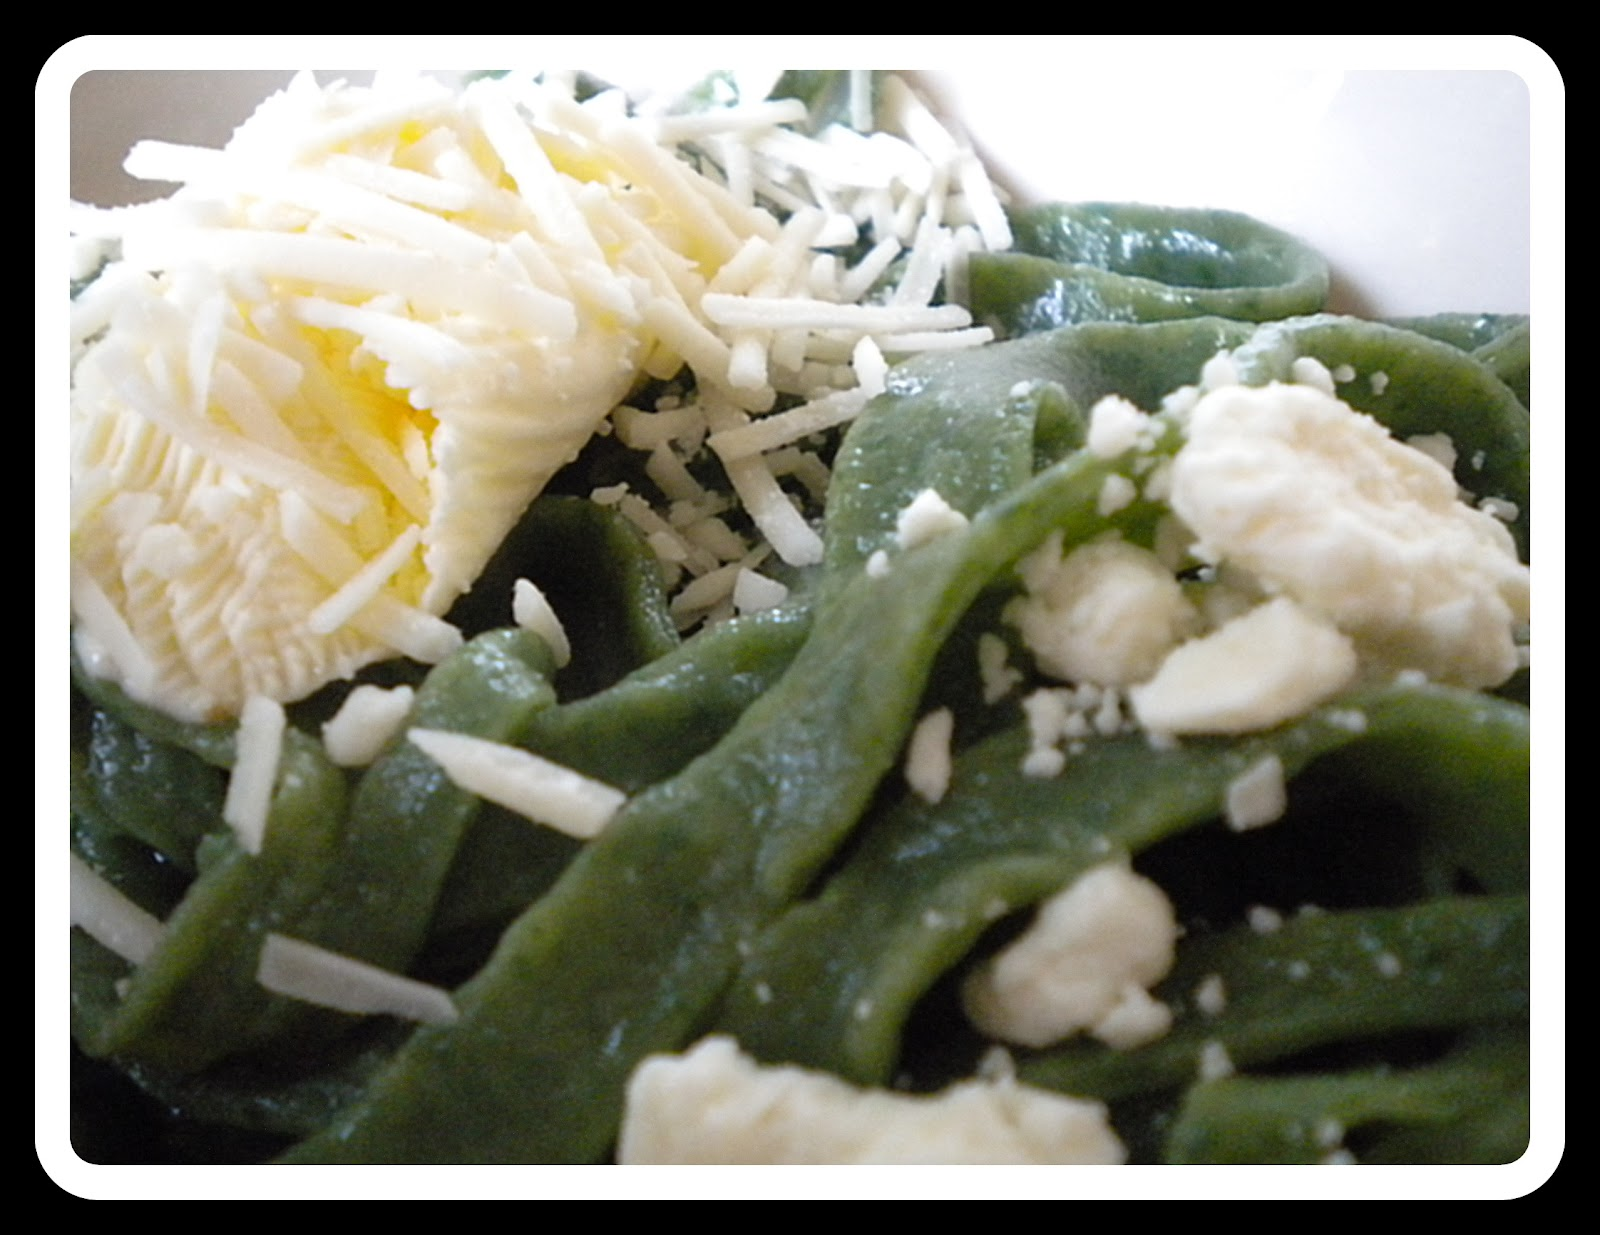 Mossy Trees: Handmade Fresh Stinging Nettle Pasta